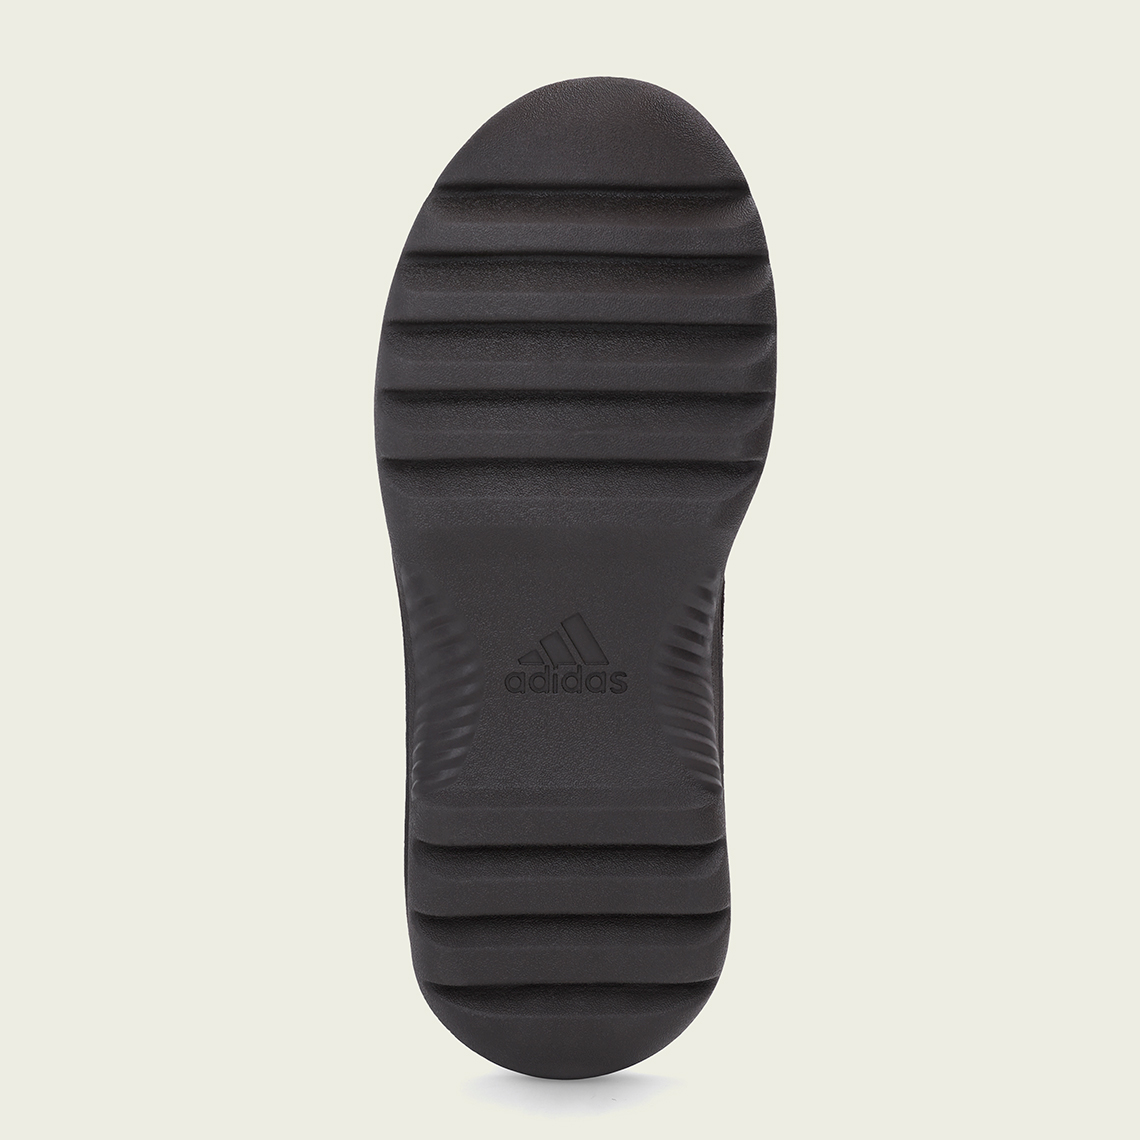 6ca6211c7a7 adidas Yeezy Desert Boot Oil Release Date